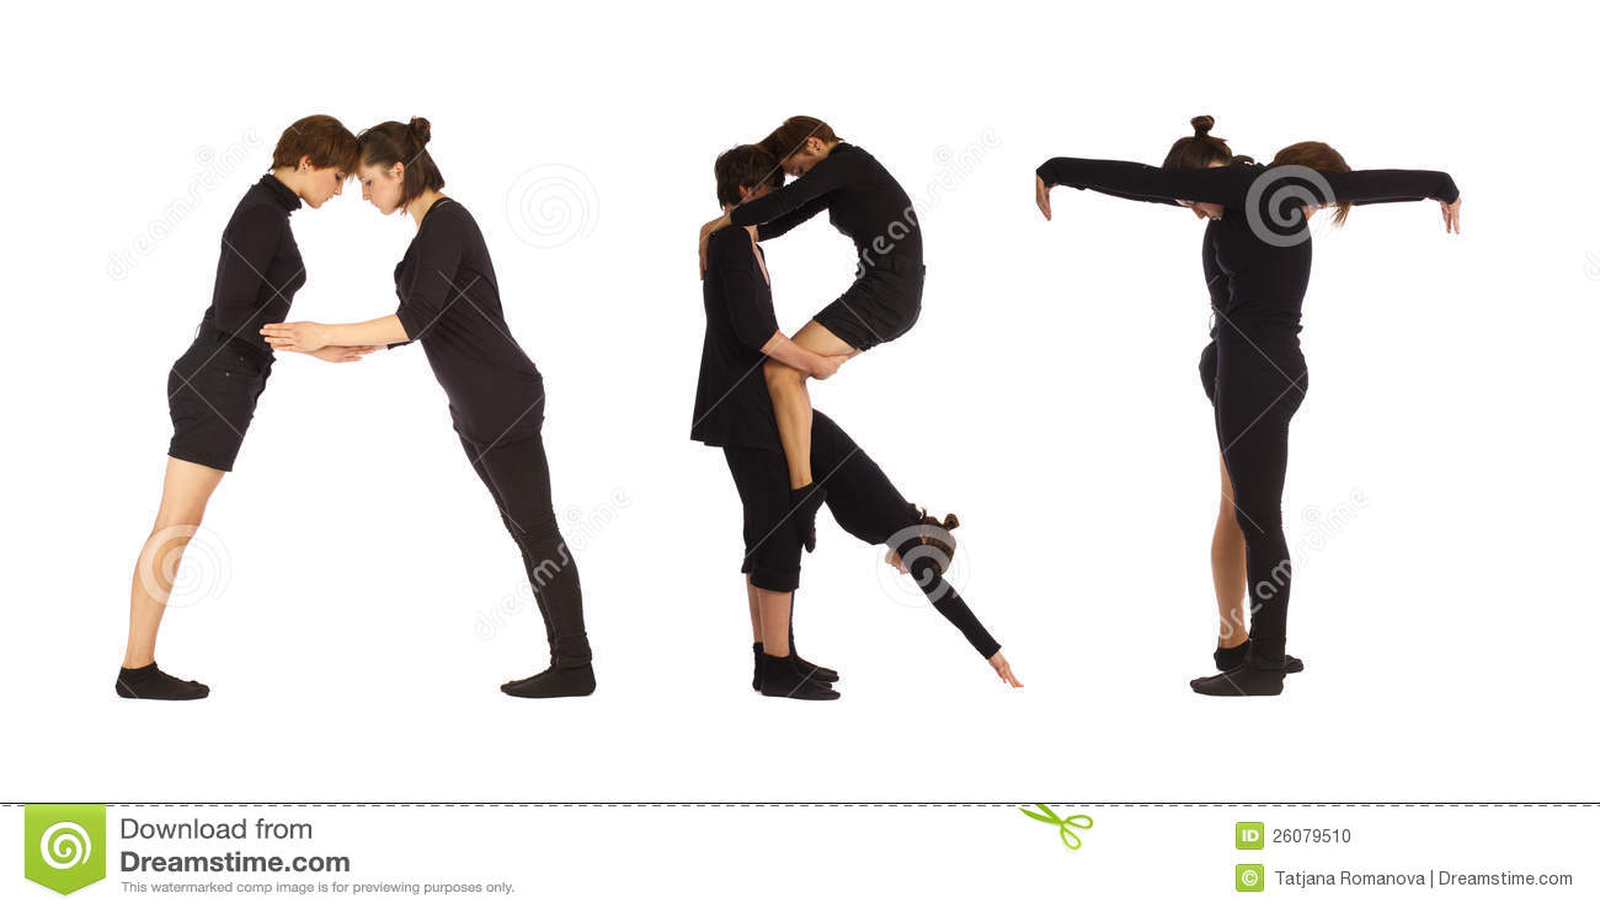 Black Dressed People Forming ART Word Stock Photo - Image: 26079510